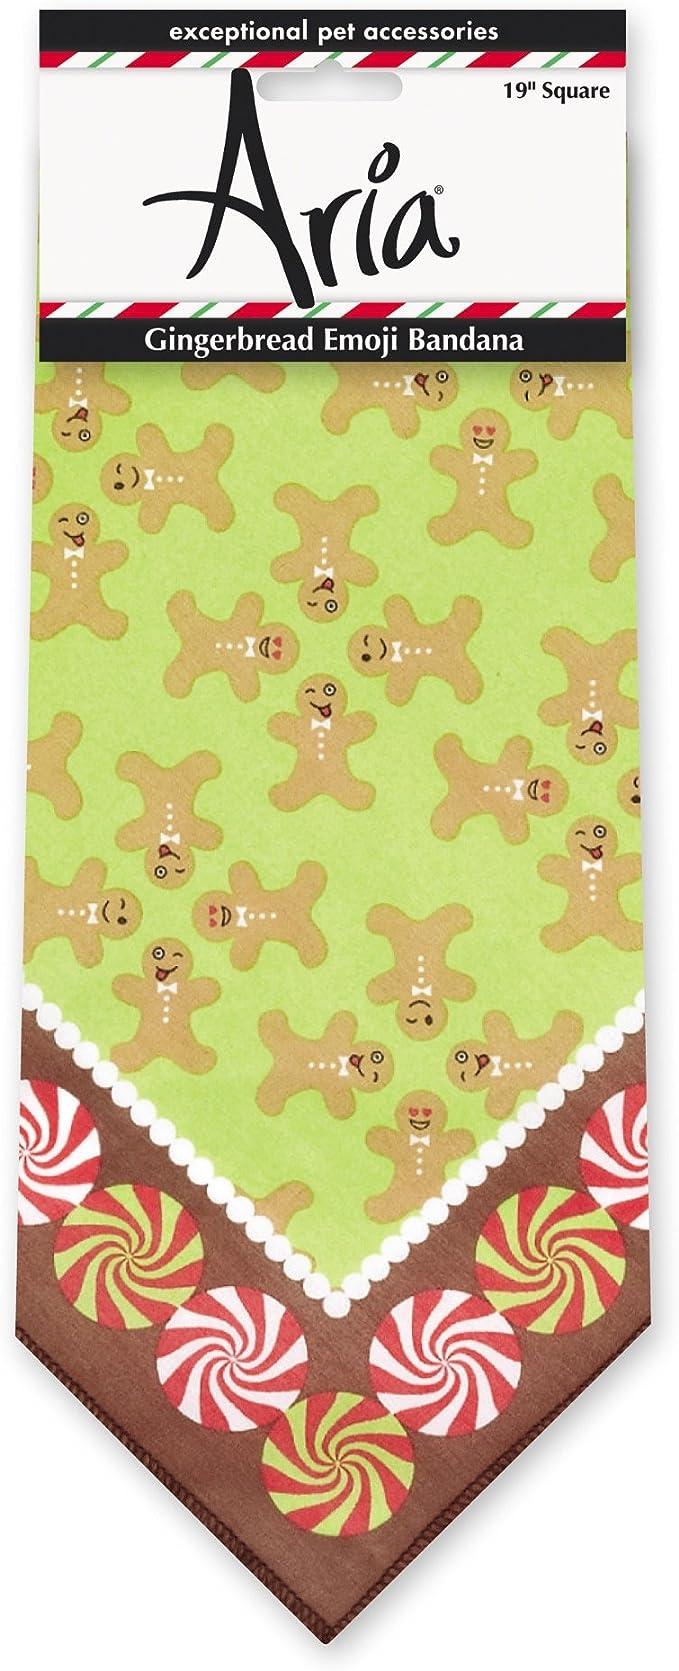 Medium Gingerbread Men Dog Bandana